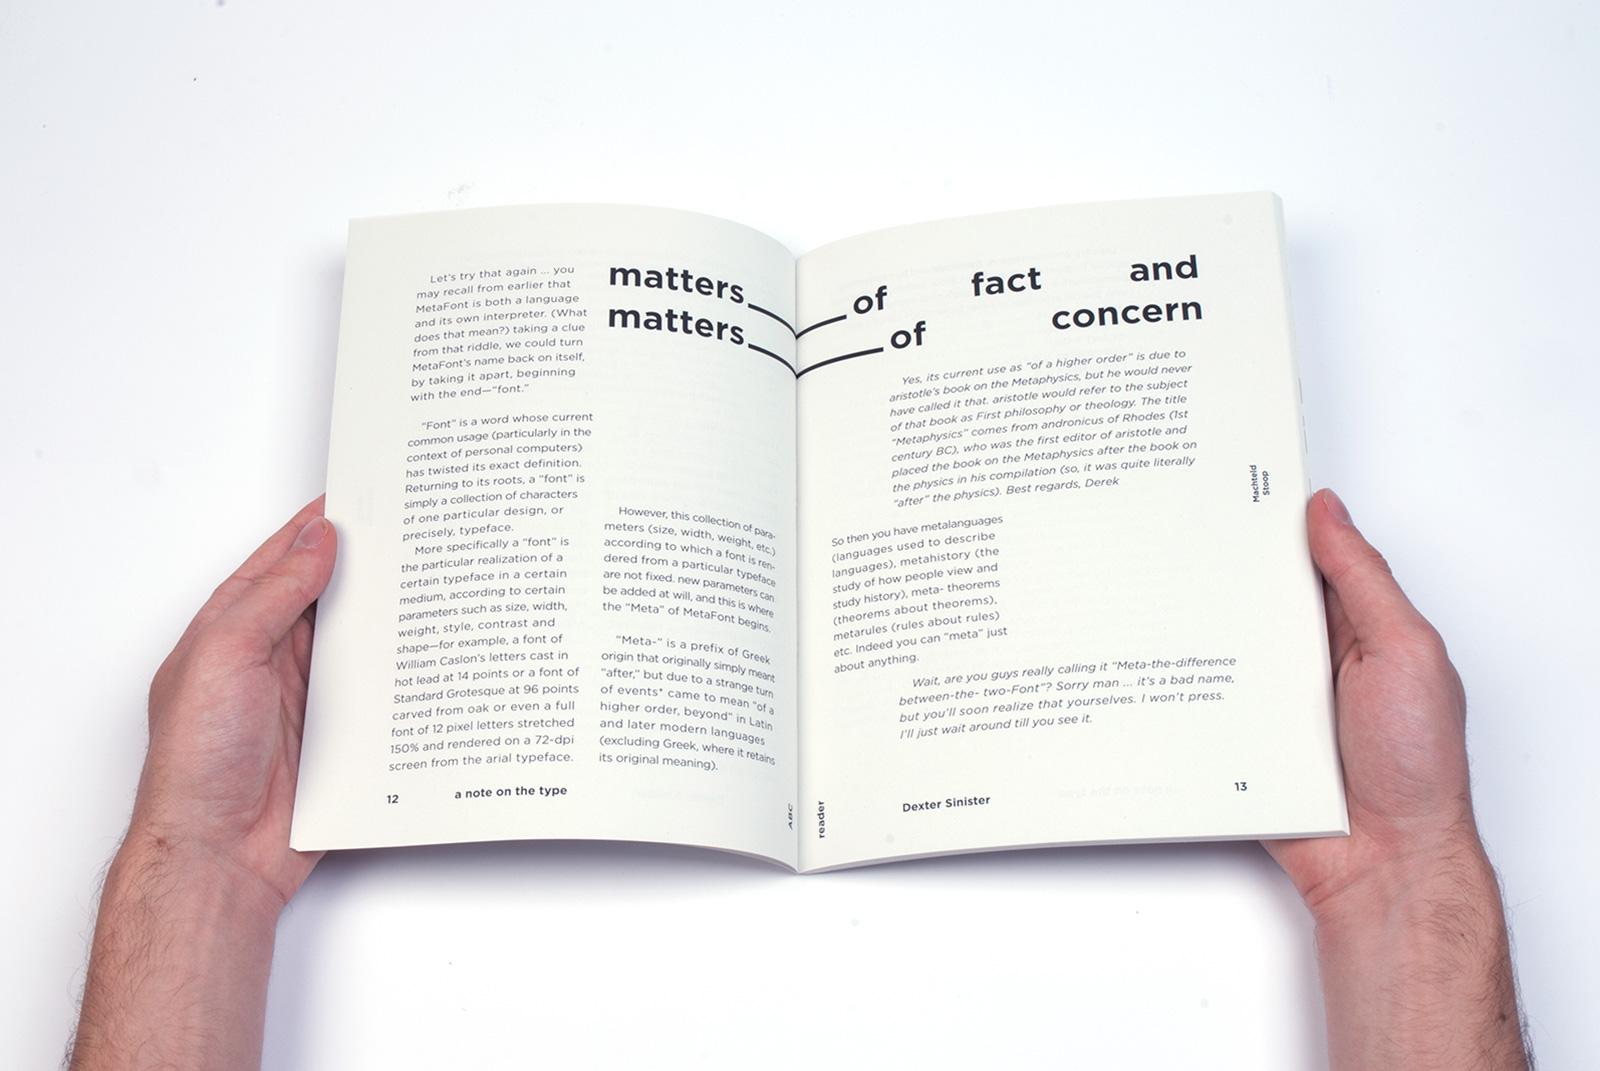 abc-typographic-reader-book-wilco-monen-03.jpg